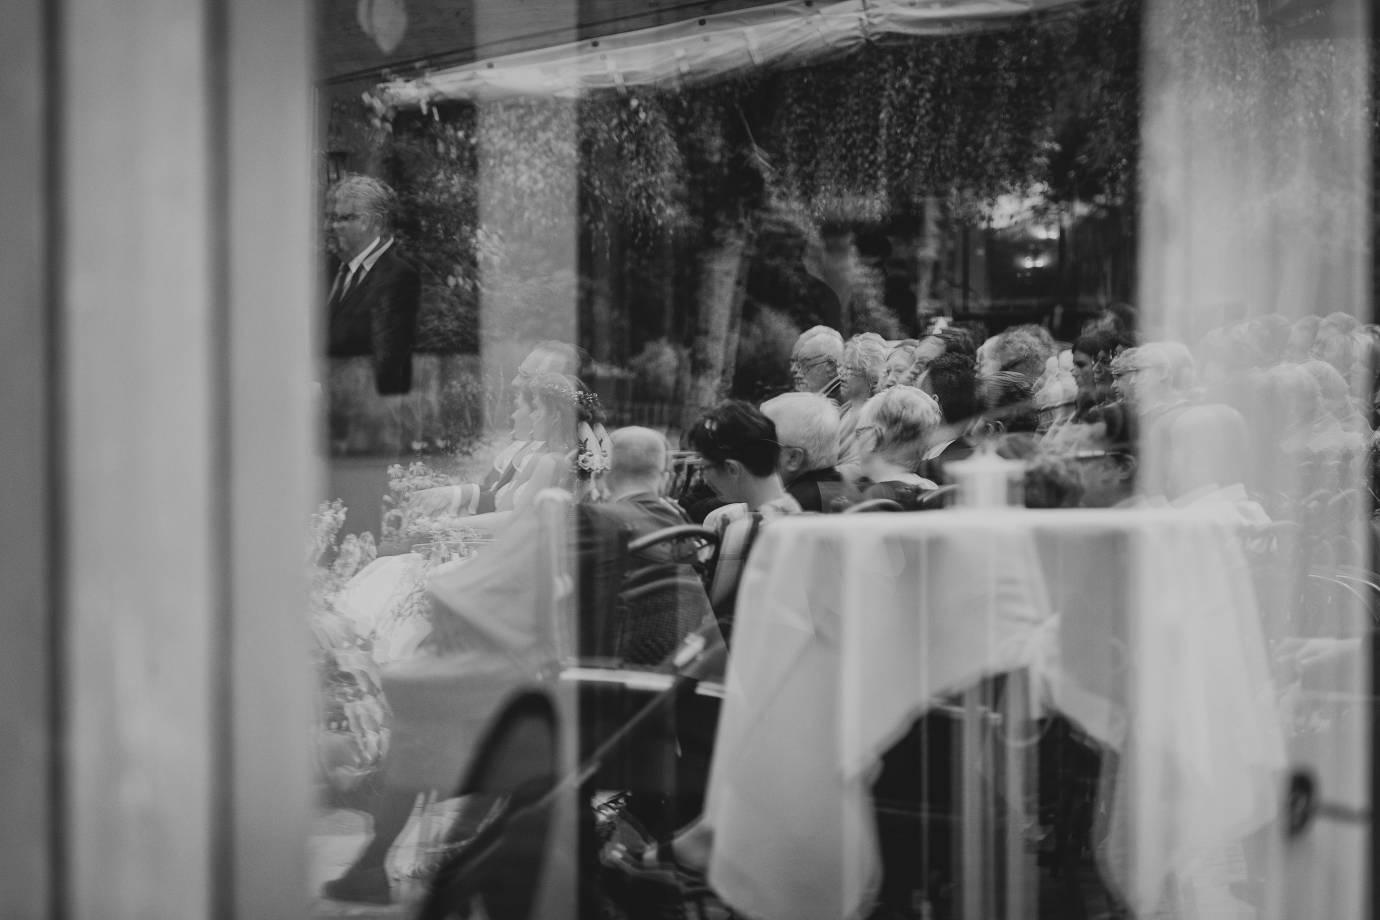 hochzeitsfotograf ganderkesee 083 - Christina+Andreas